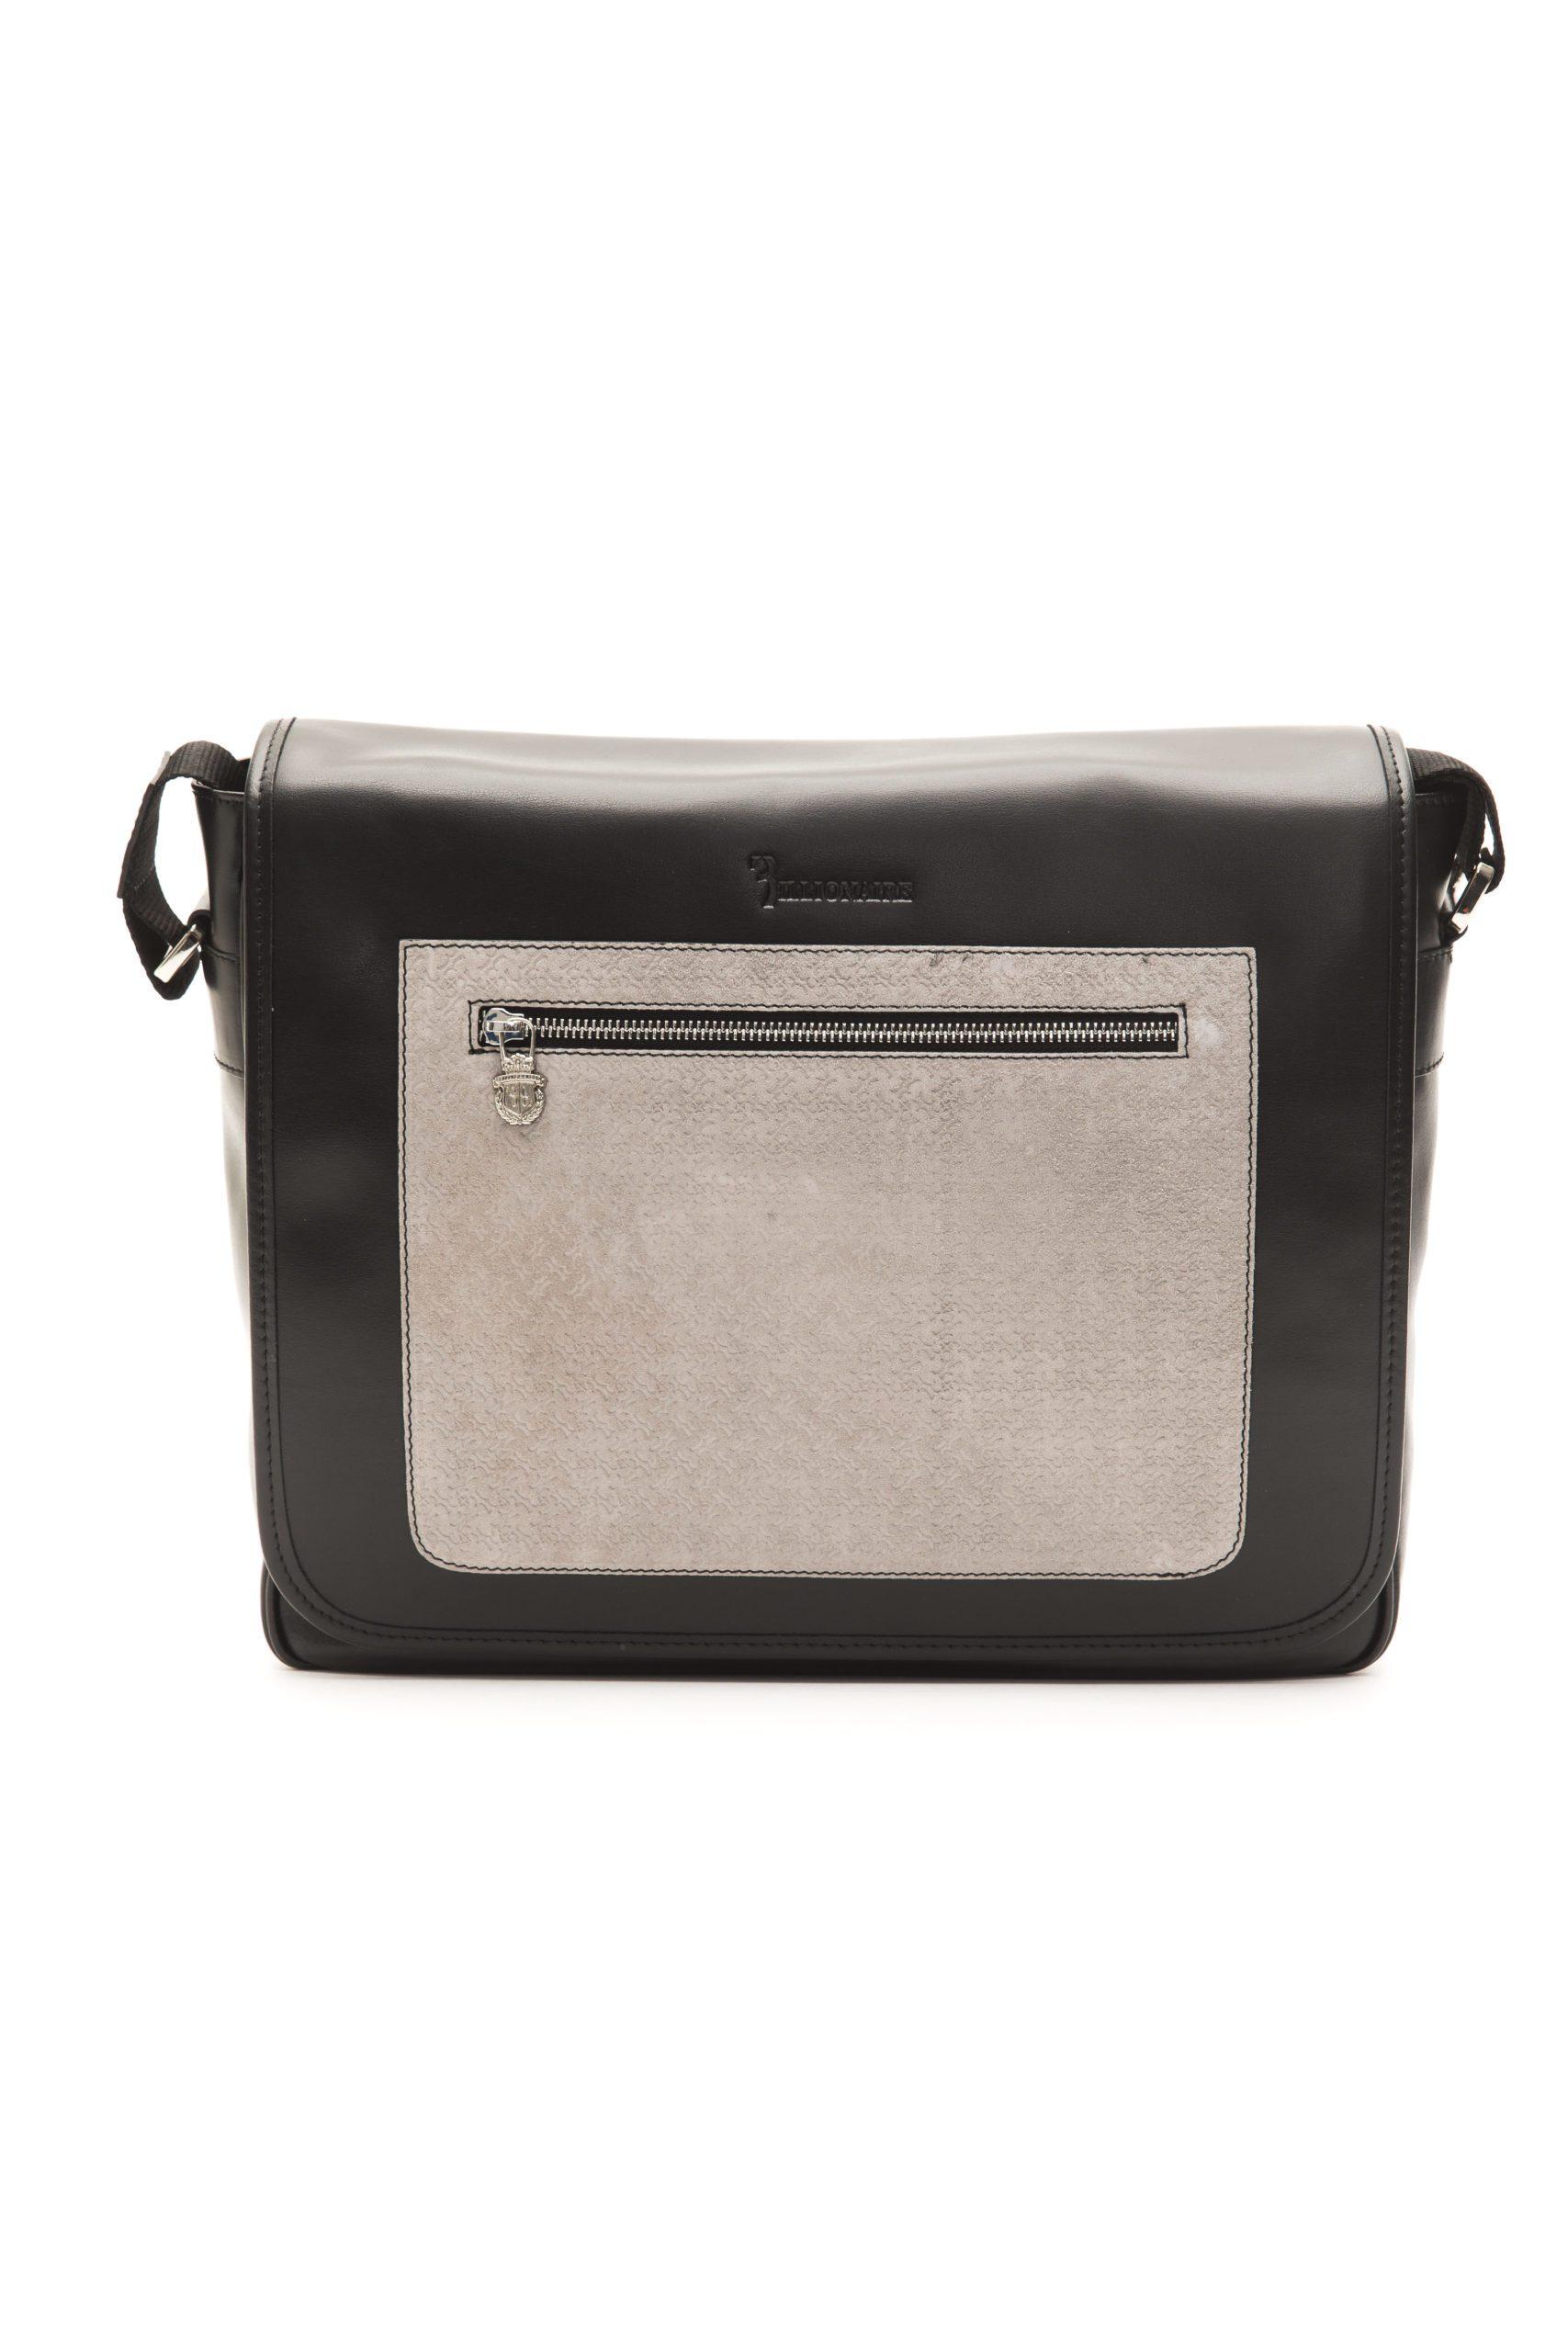 Billionaire Italian Couture Men's Messenger Bag Black BLC50406041A-034CV_BlackGrey